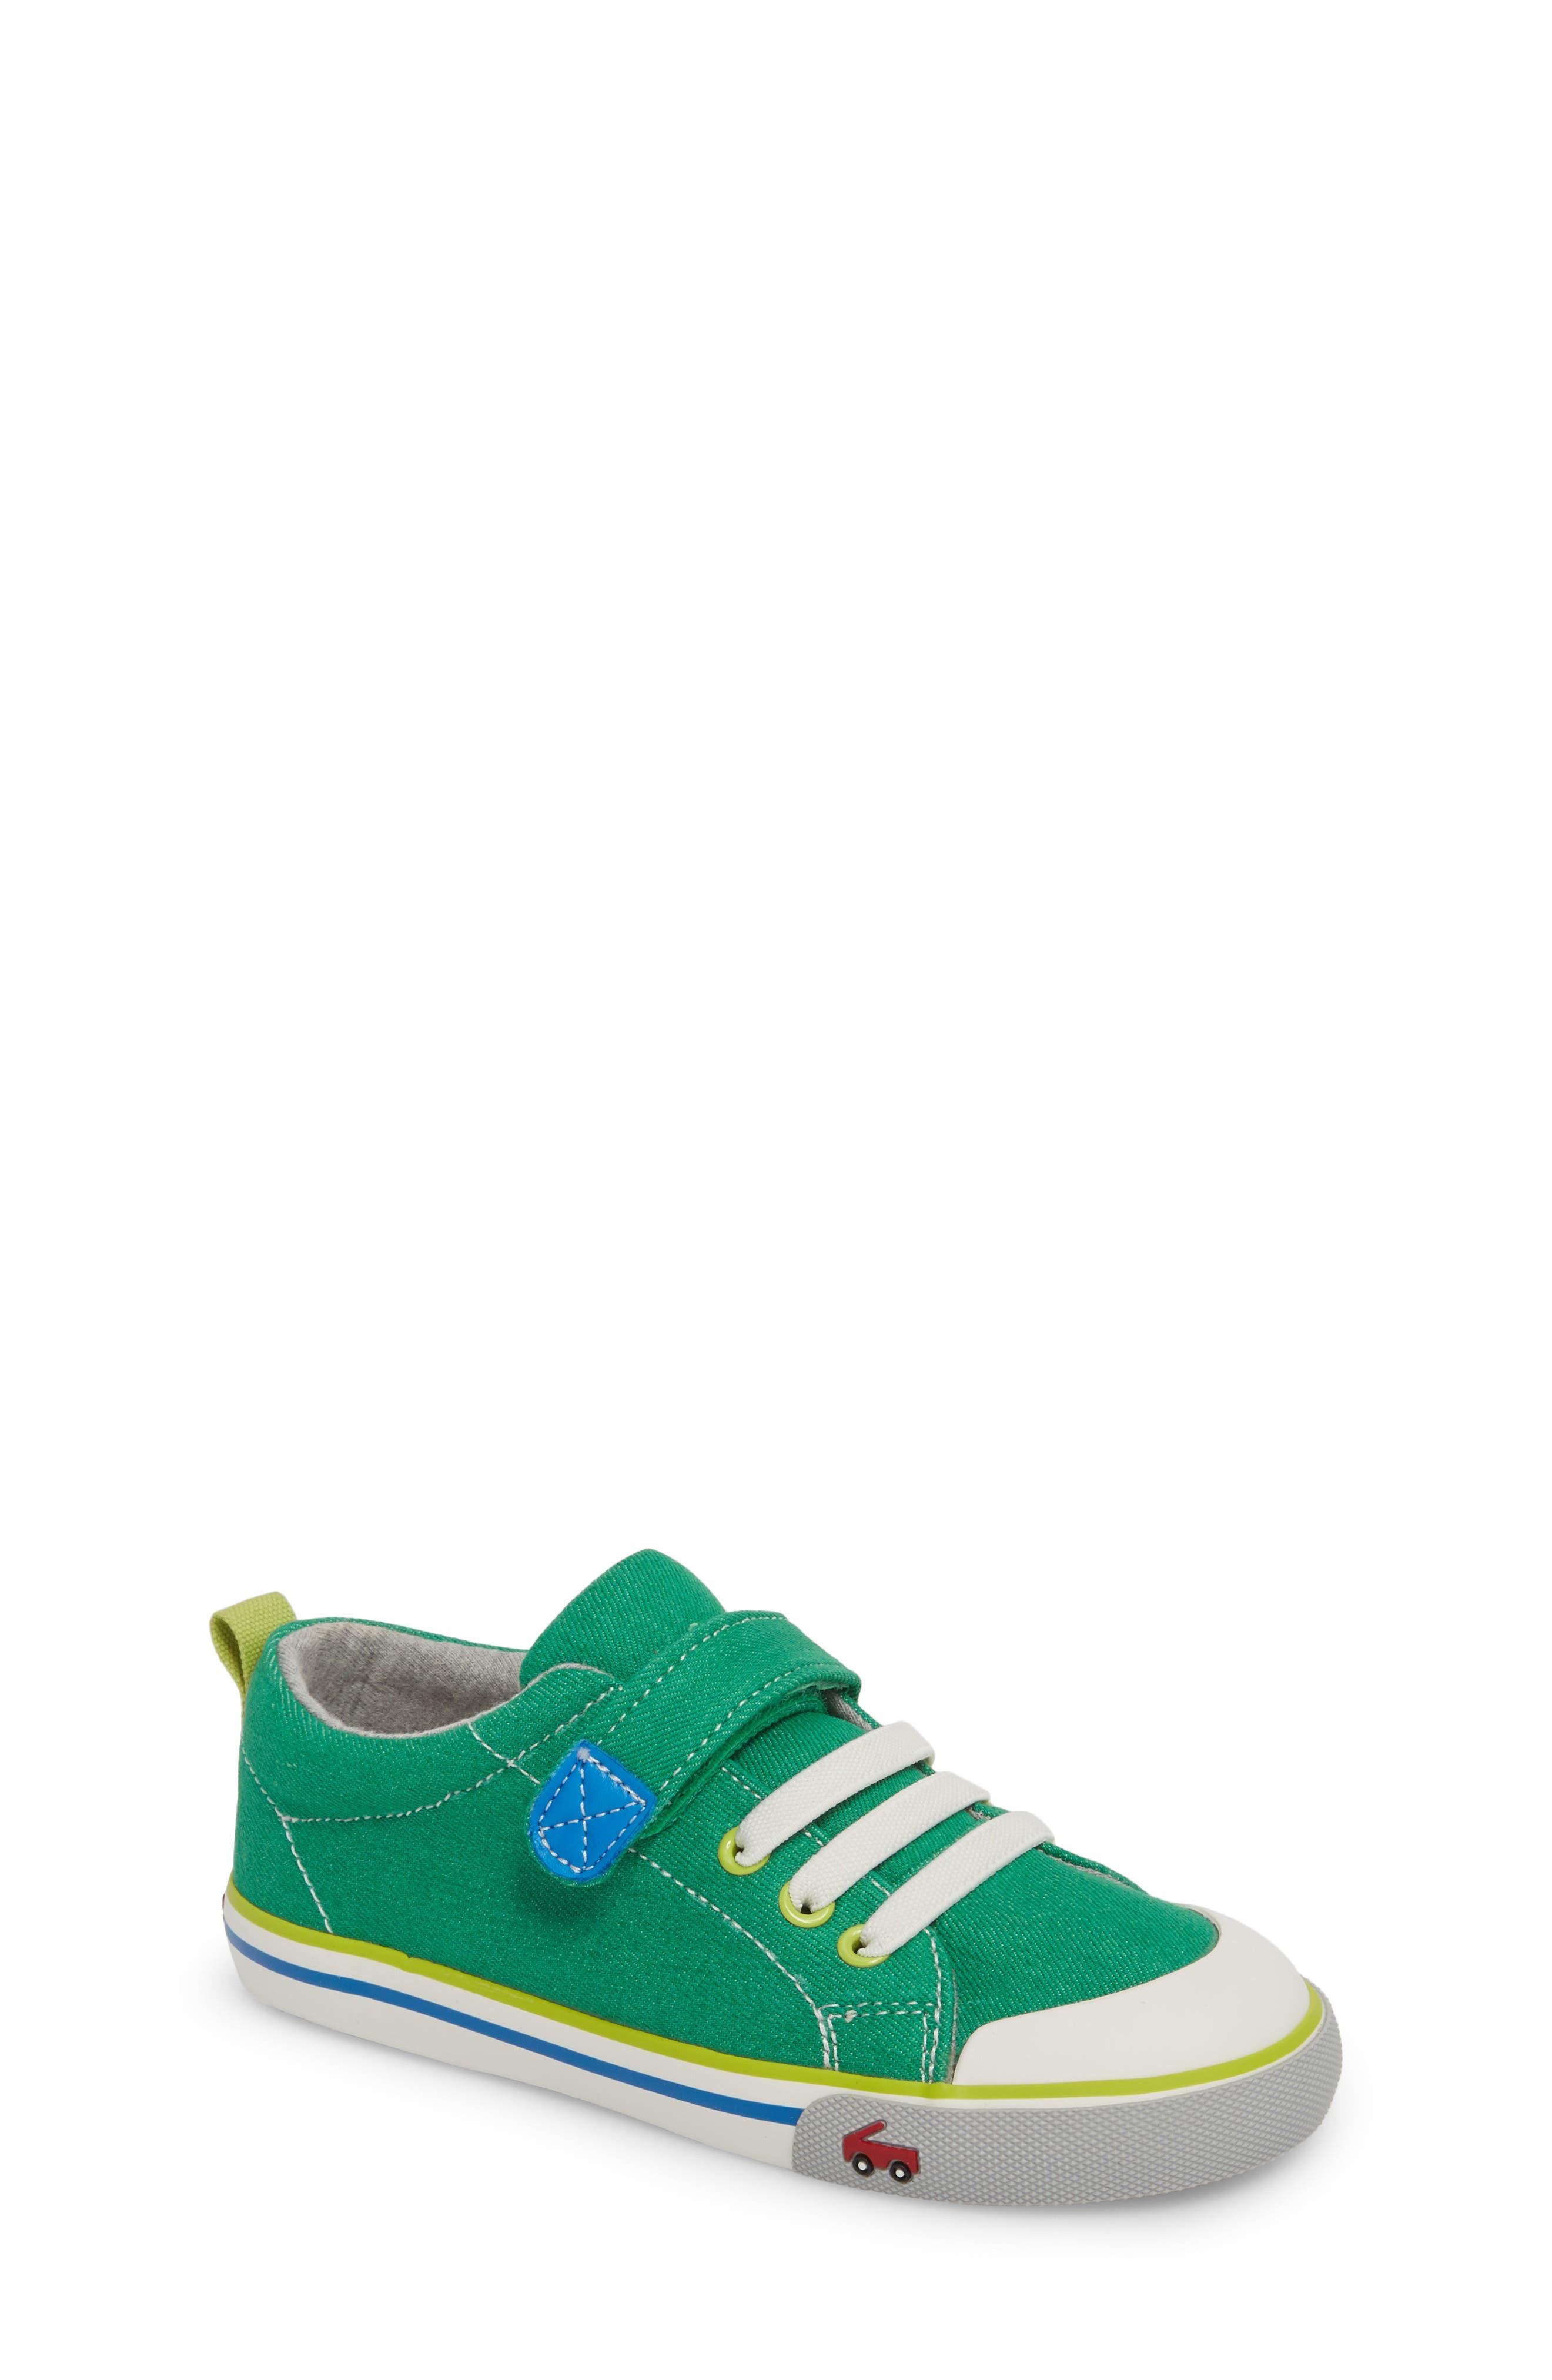 Alternate Image 1 Selected - See Kai Run Stevie II Sneaker (Baby, Walker & Toddler)